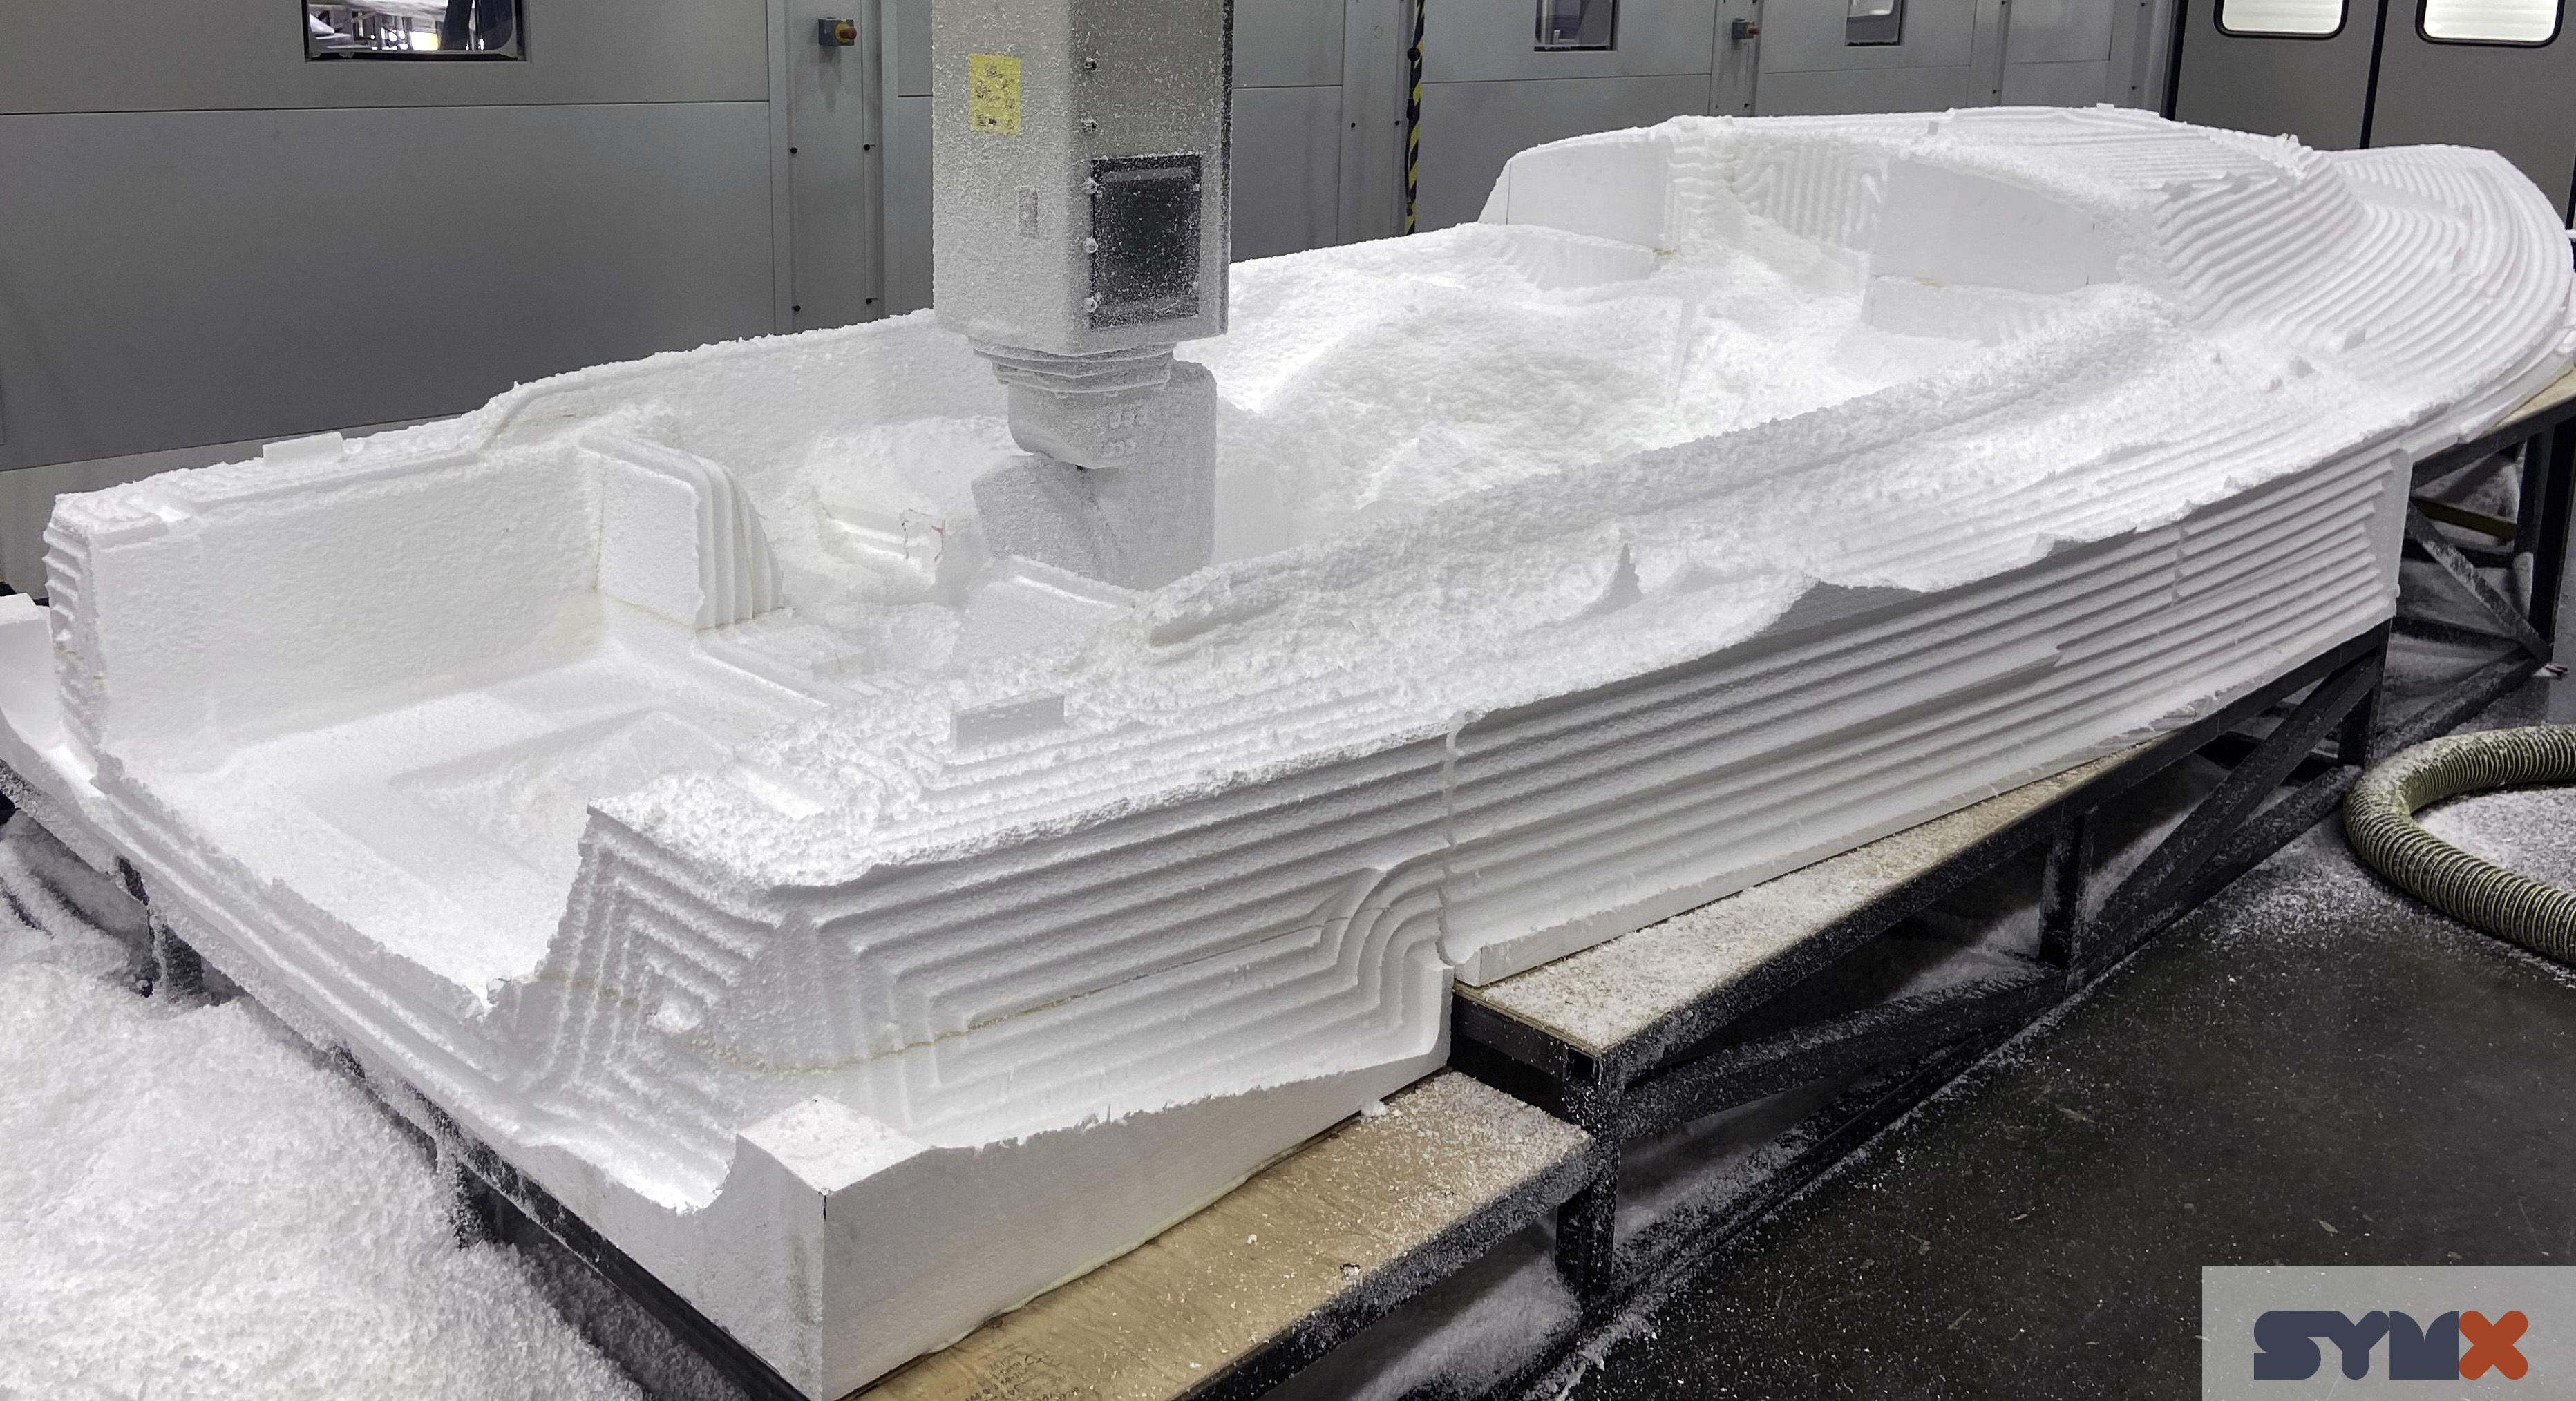 J/9 deck mold CNC milling